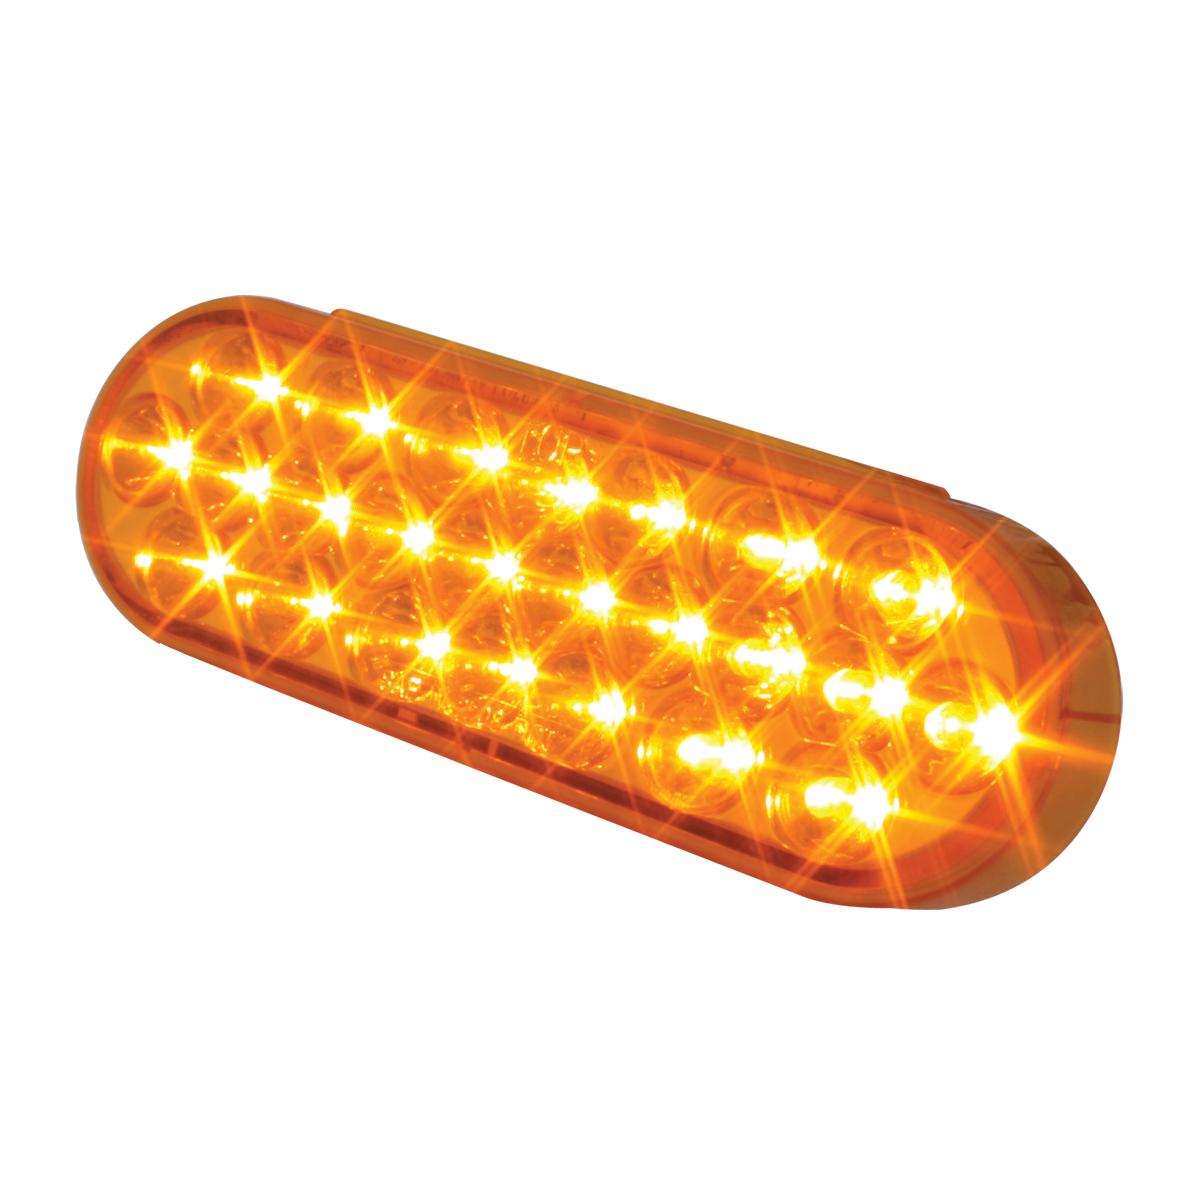 76525 Oval Pearl LED Strobe Light in Amber/Amber